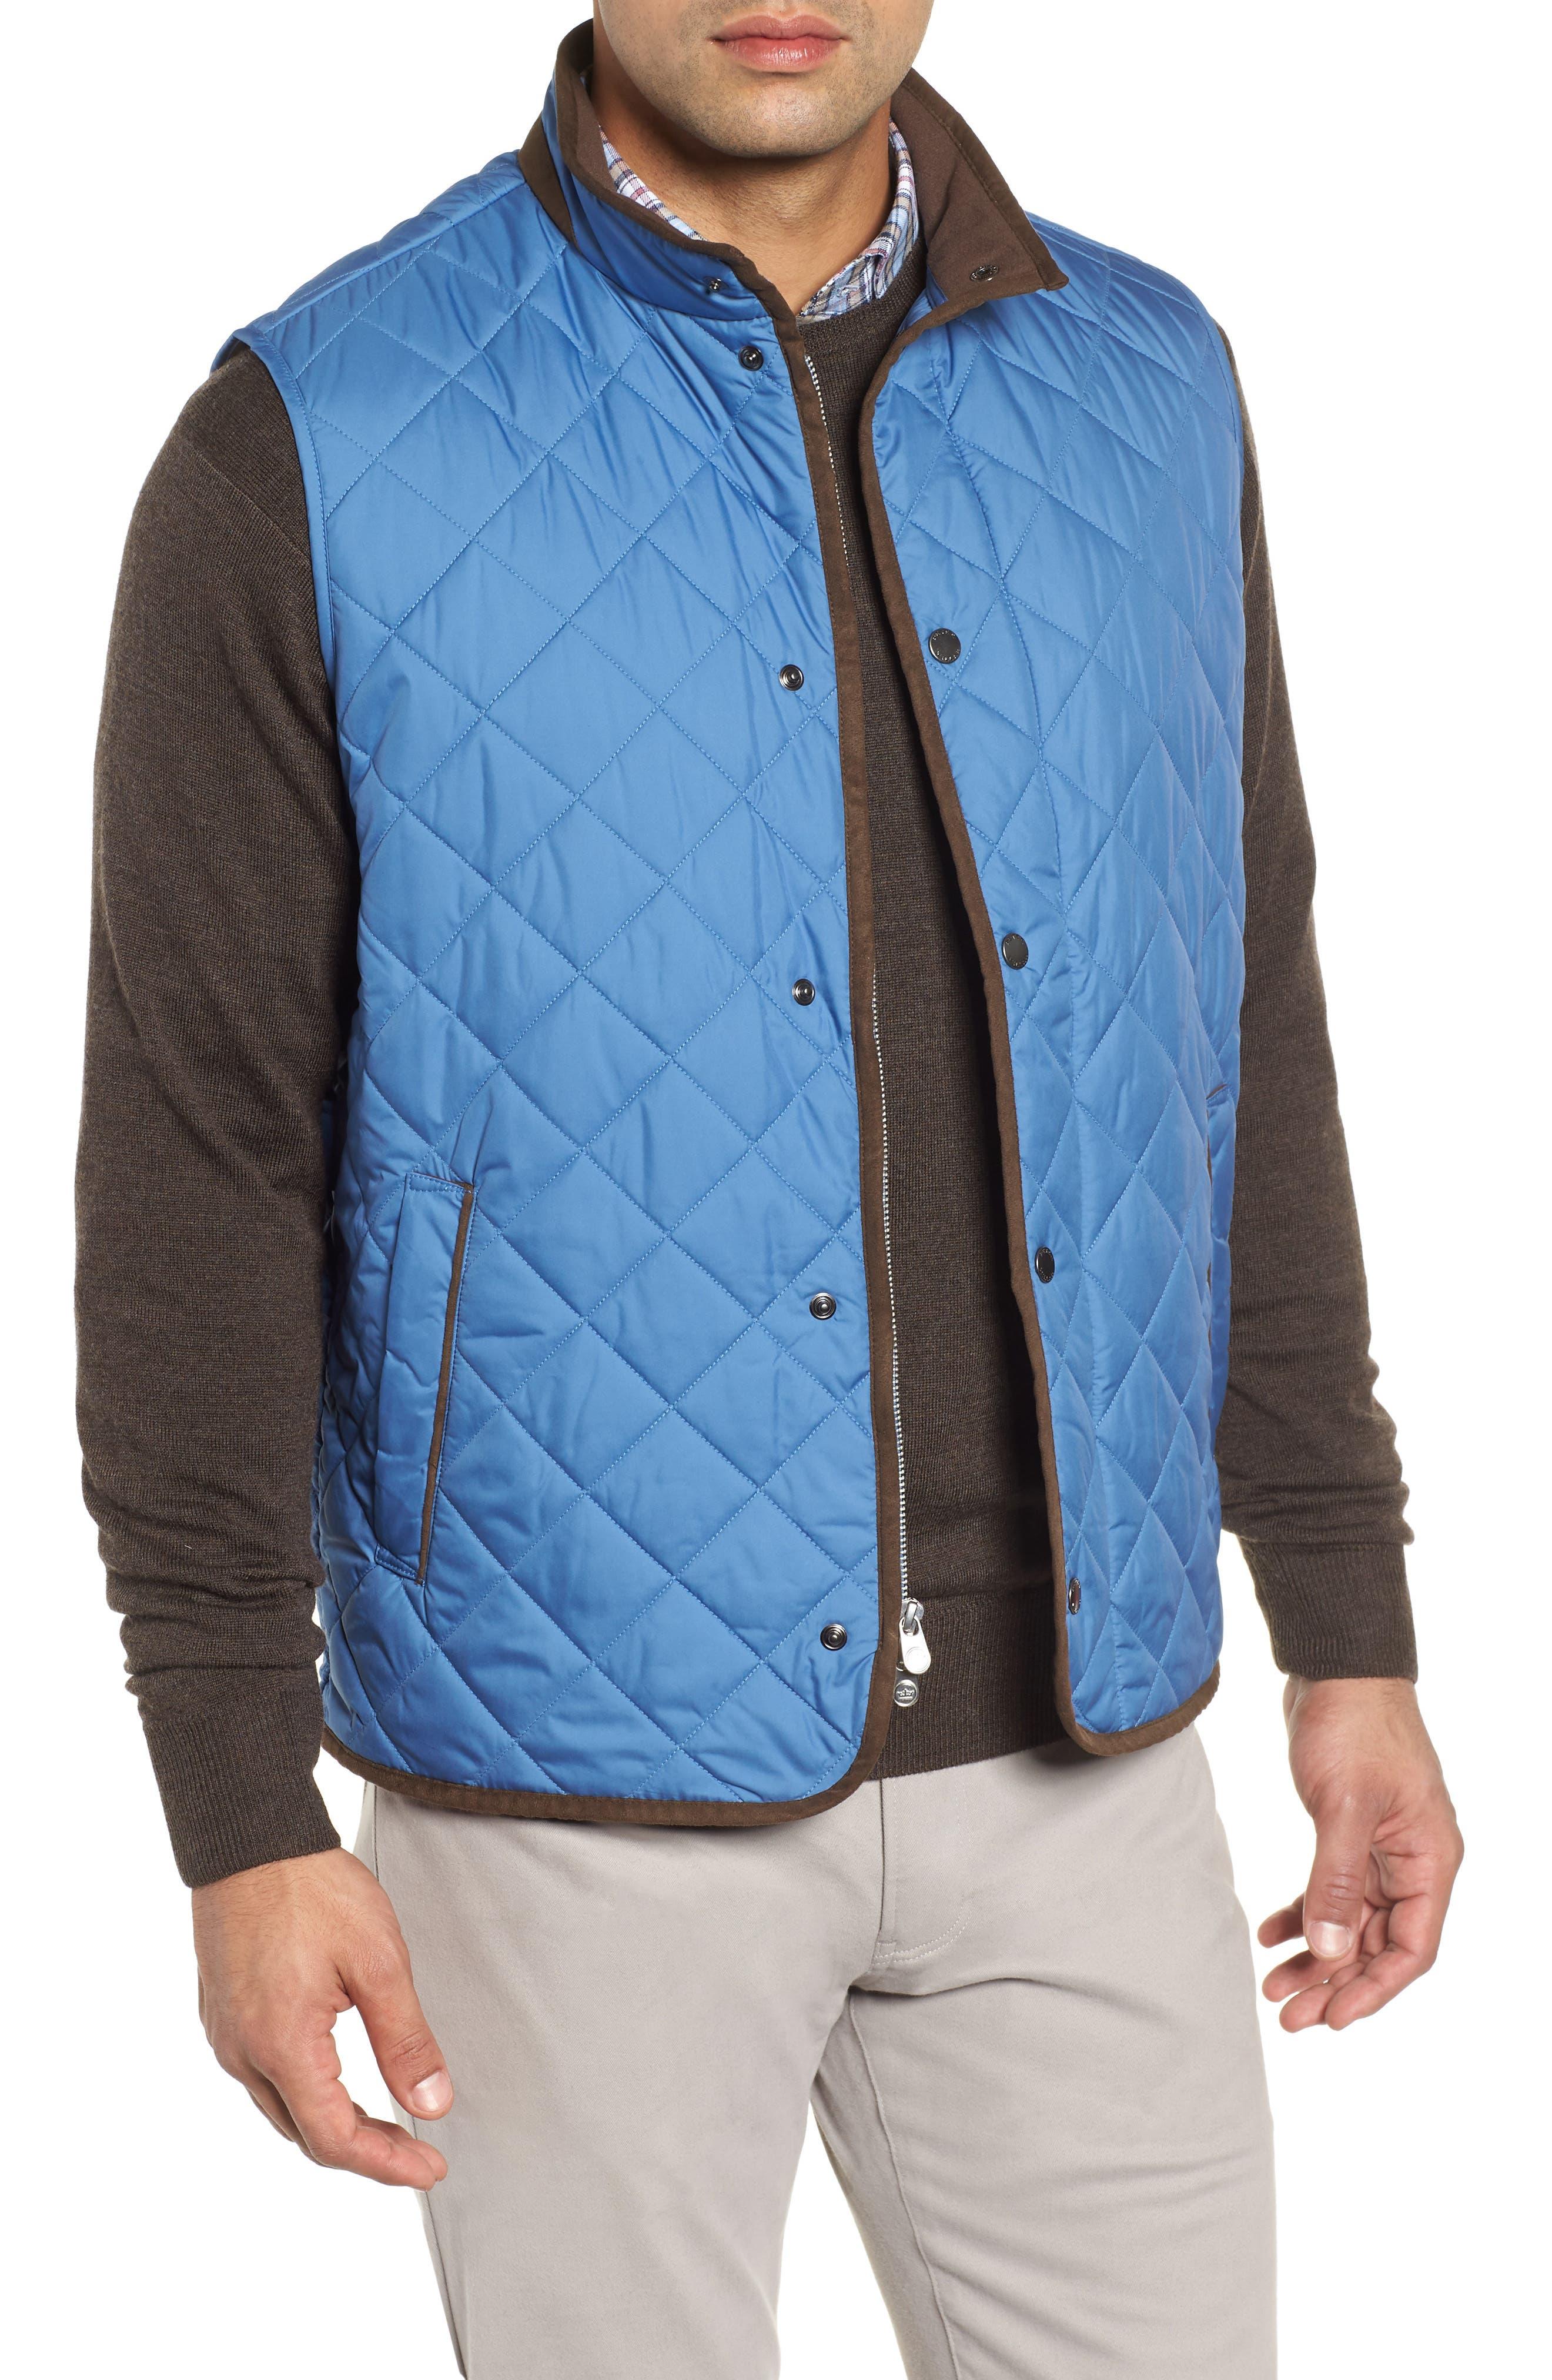 Peter Millar Essex Quilted Vest, Blue